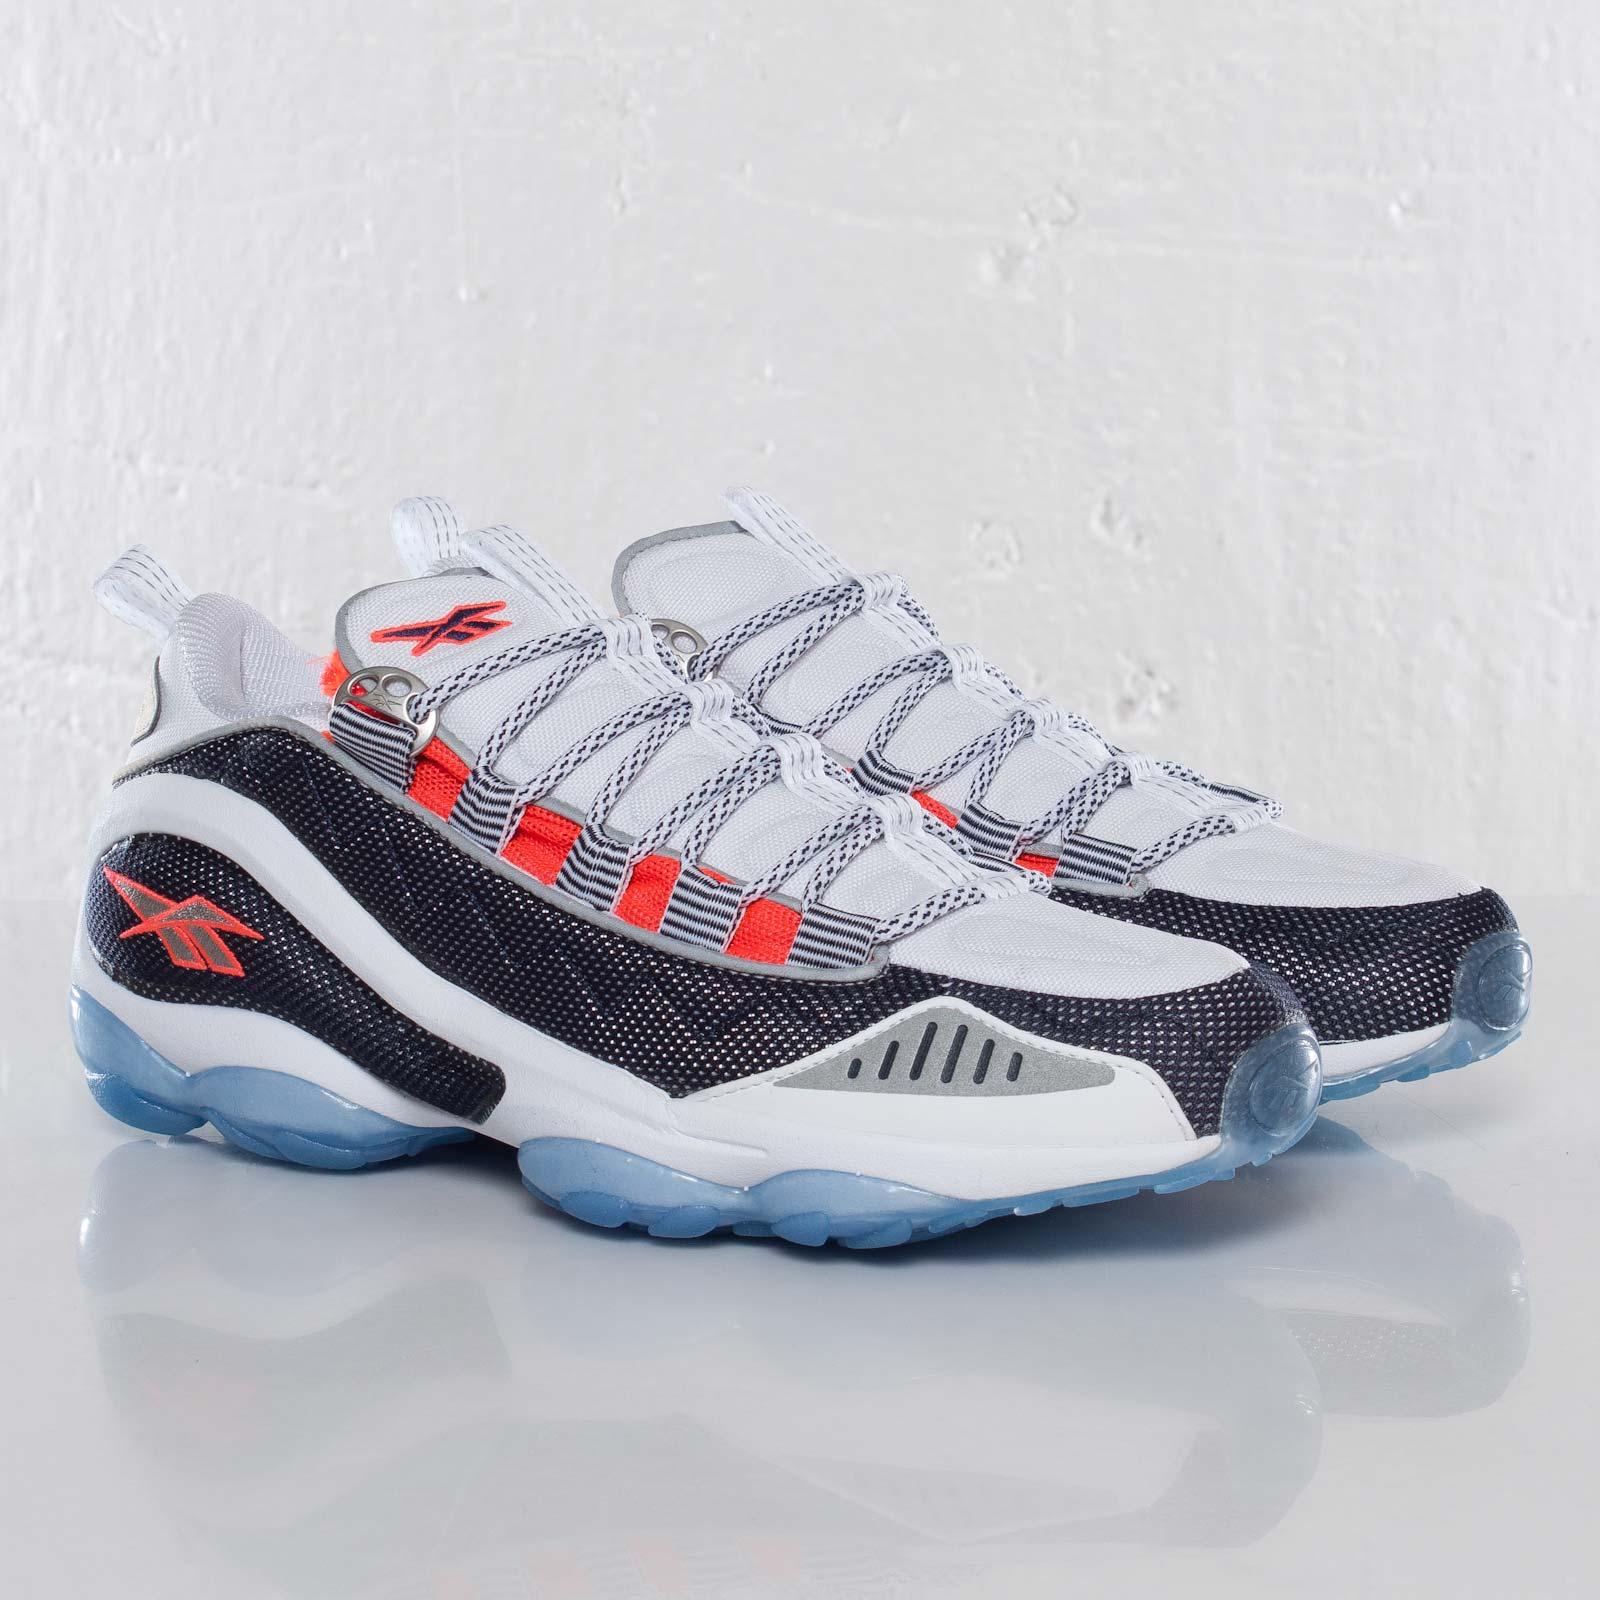 10 Dmx Reebok Streetwear SneakersnstuffSneakeramp; V44397 Run TPXukiOZ